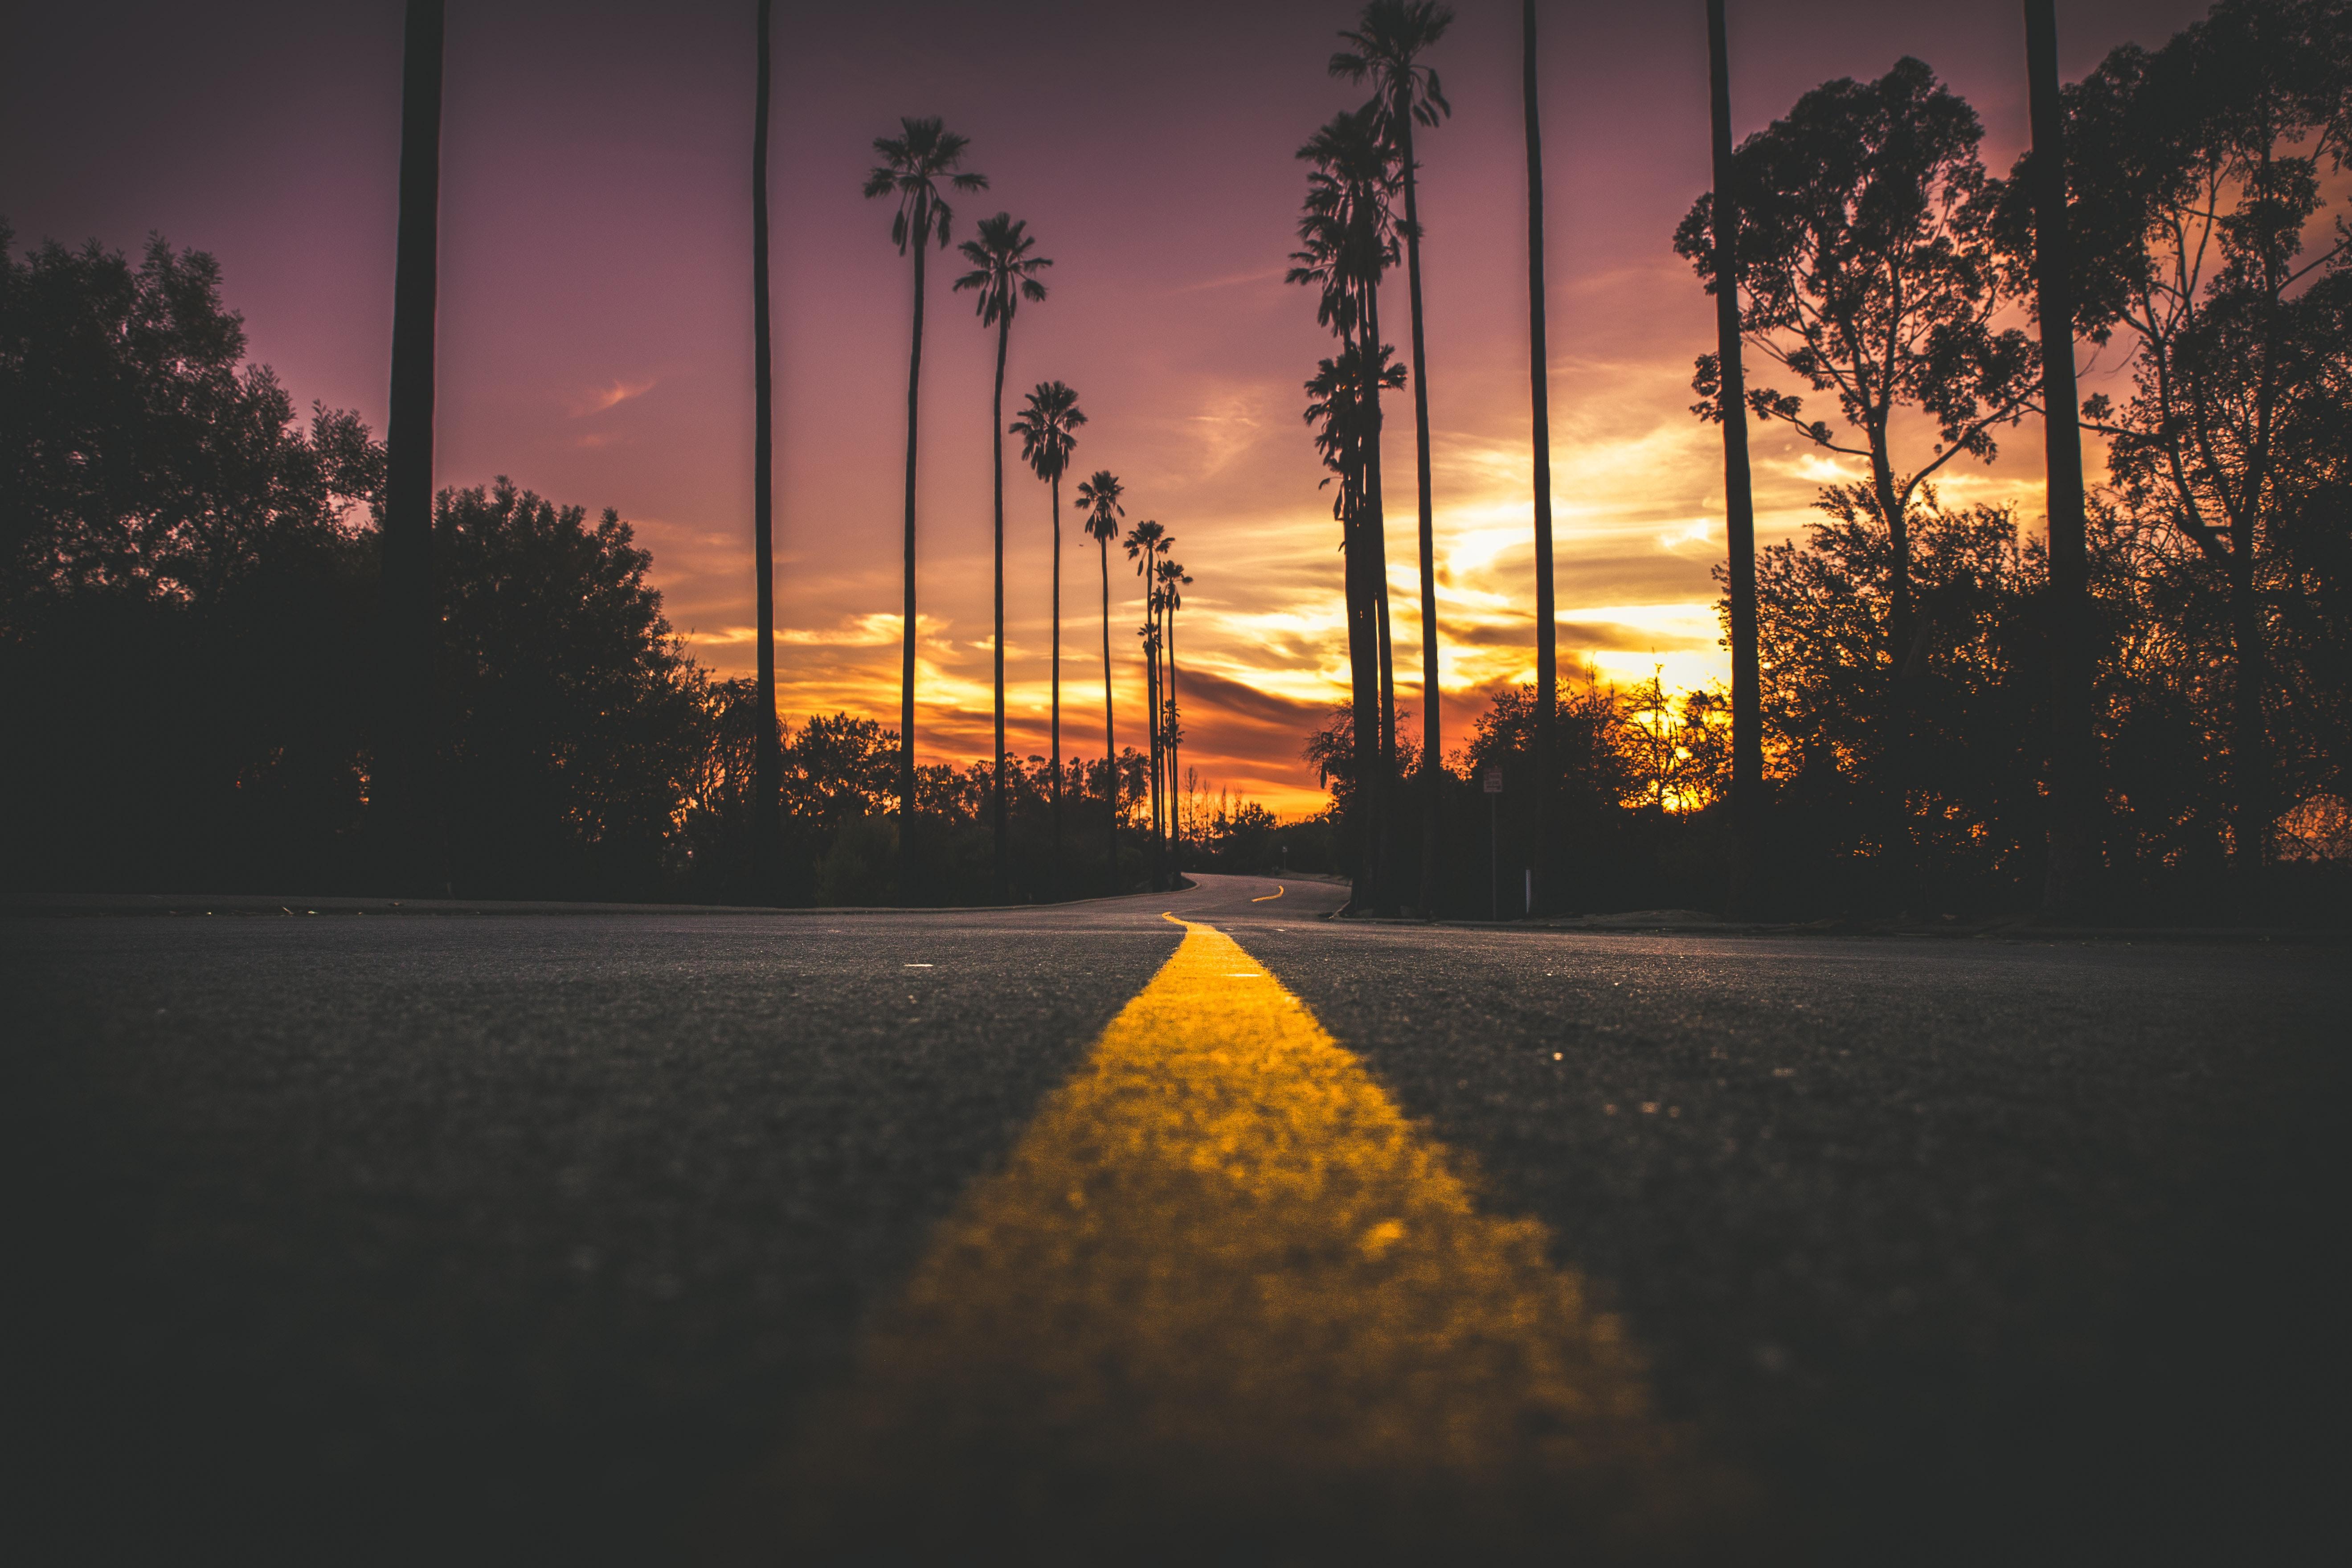 glow in the dark road